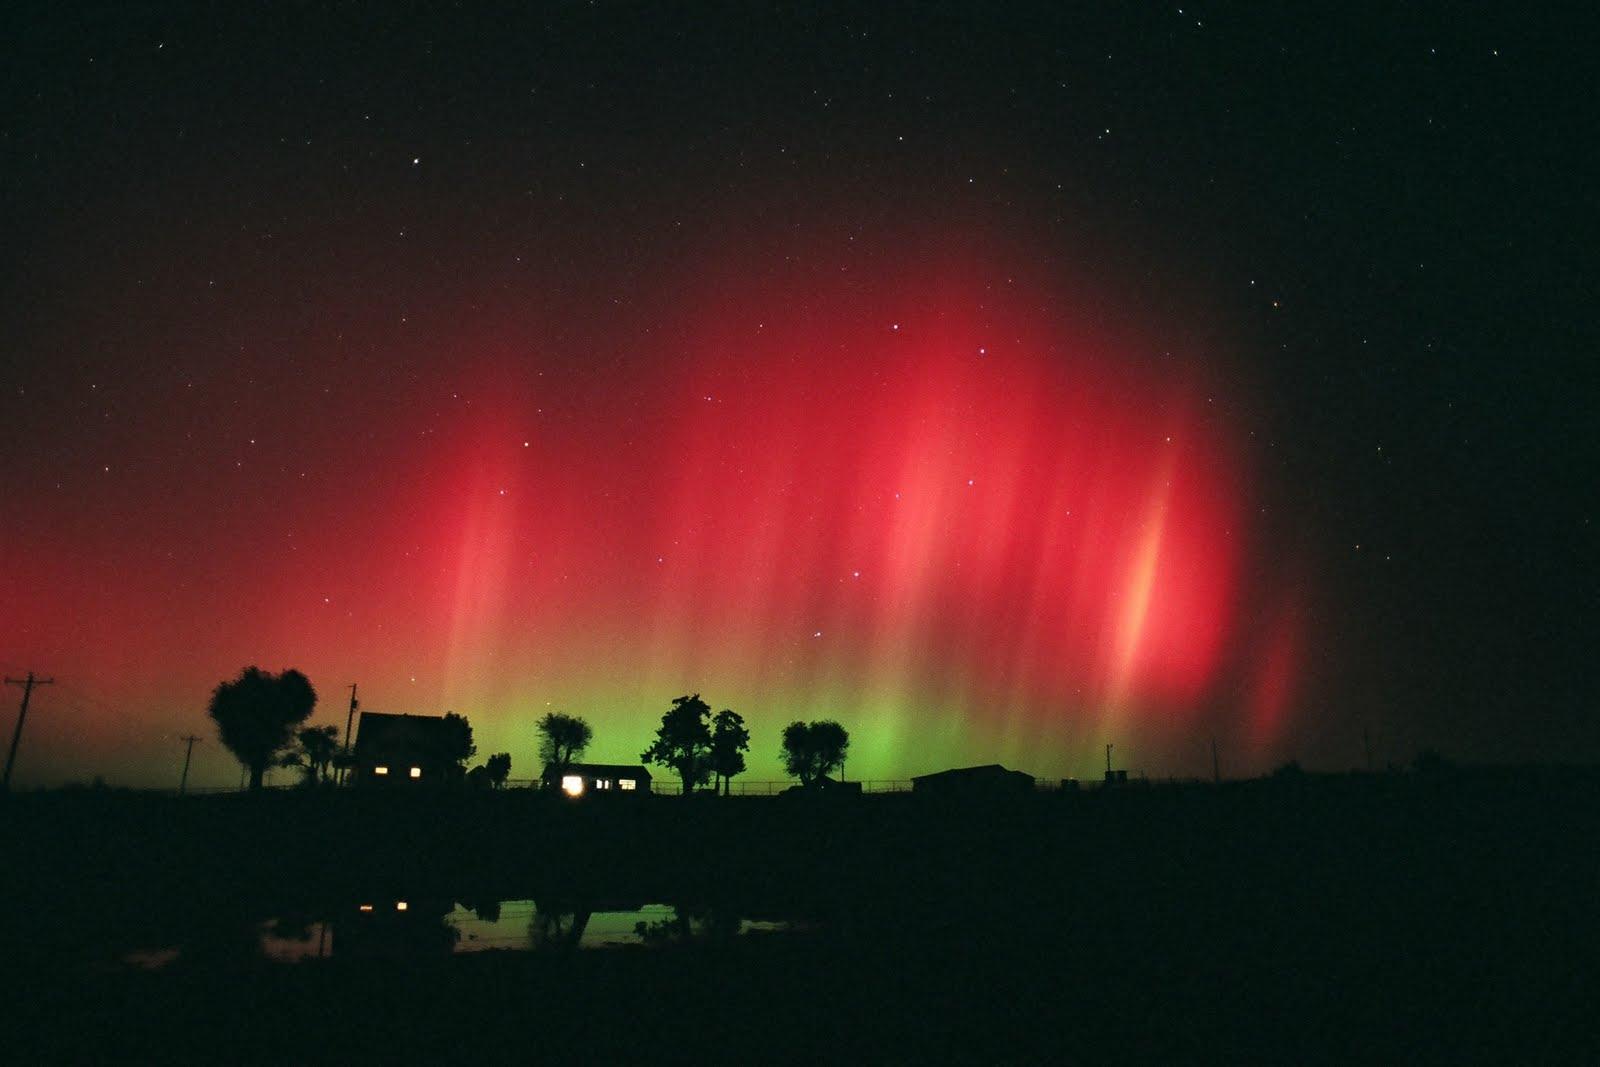 http://4.bp.blogspot.com/_RbPgMdZxm3g/TG0h3SLTaZI/AAAAAAAAABA/Y7isWJ1gOuE/s1600/auroraOK_ewoldt_f1.jpg